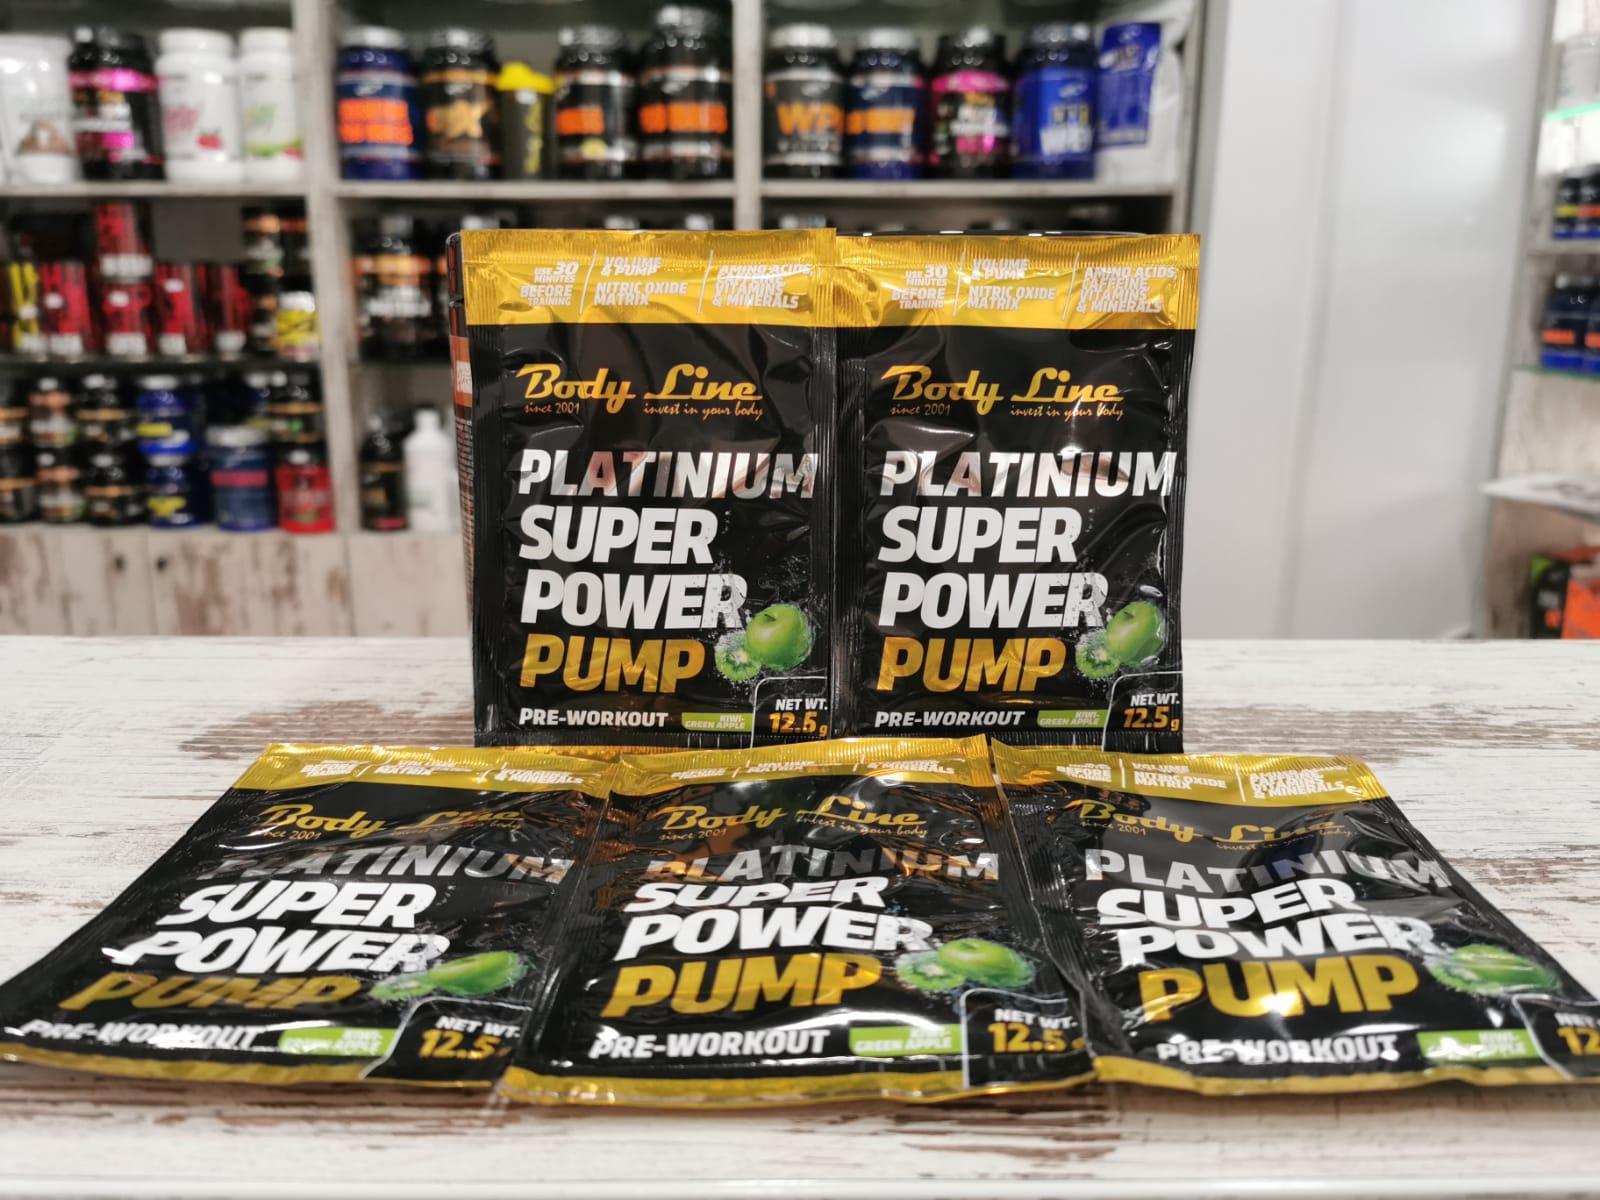 Pre-workout - S.P.P. – SUPER POWER PUMP by Body Line